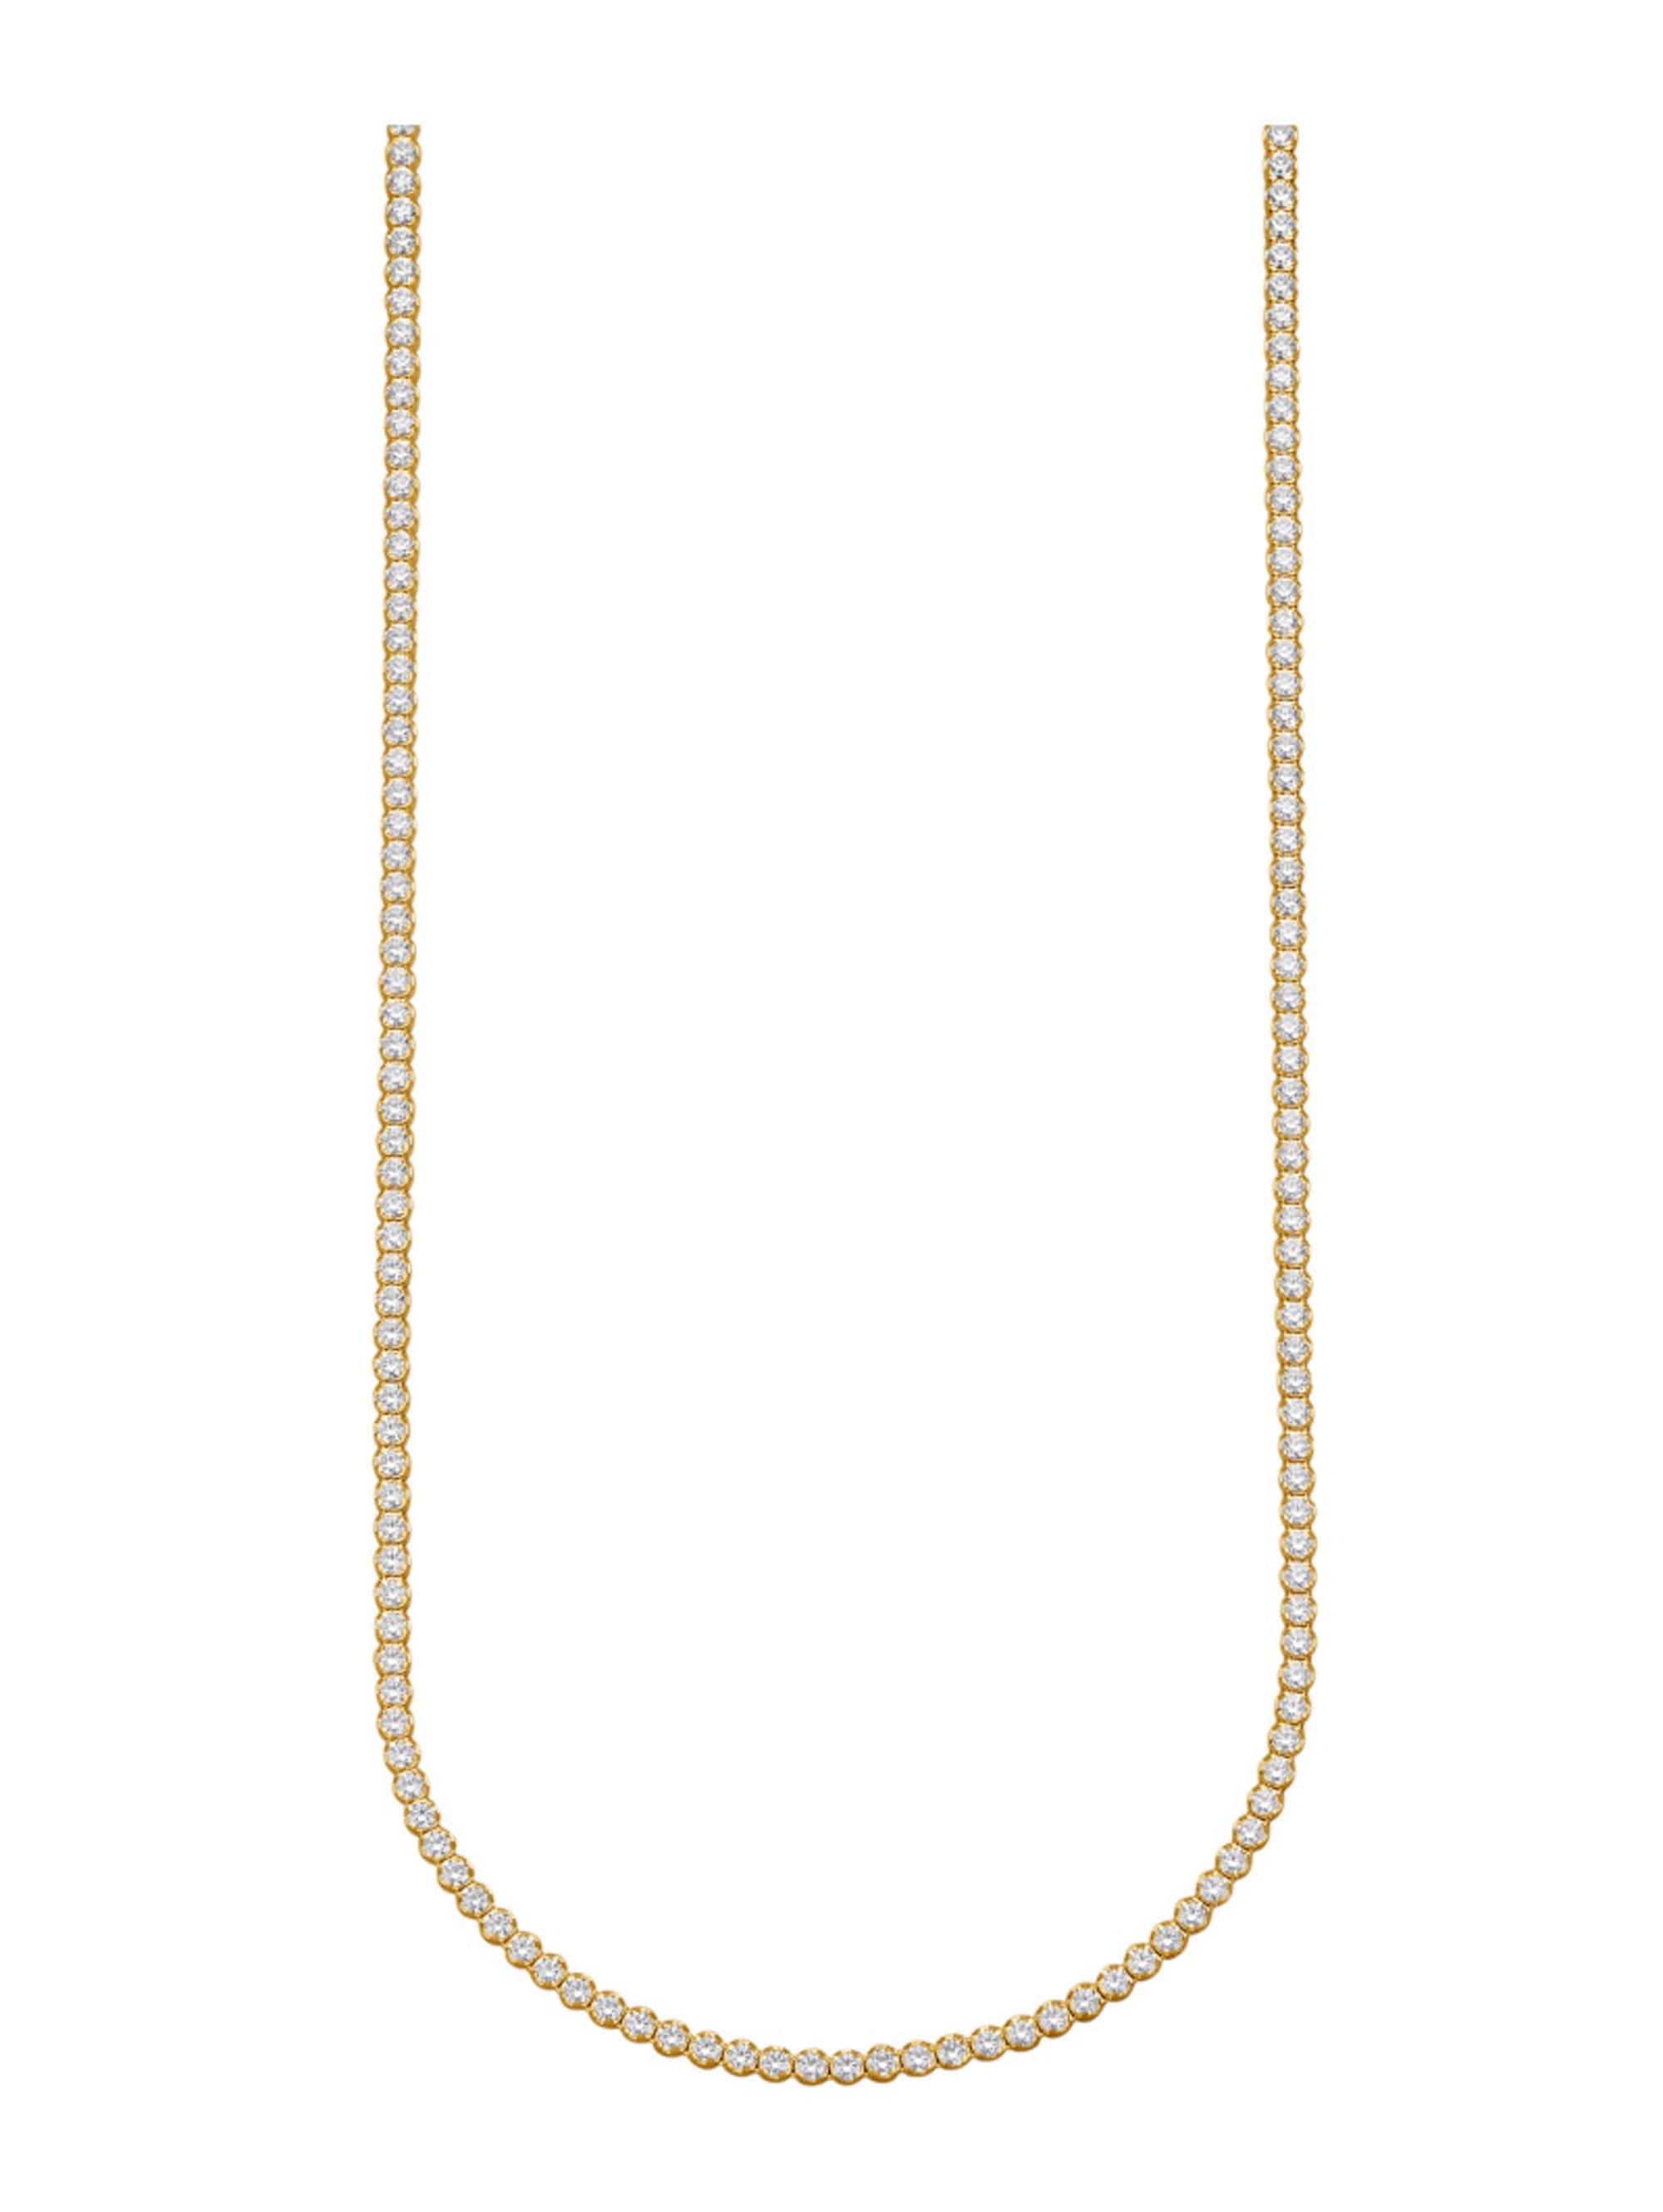 Halskette mit Zirkonia egGkk